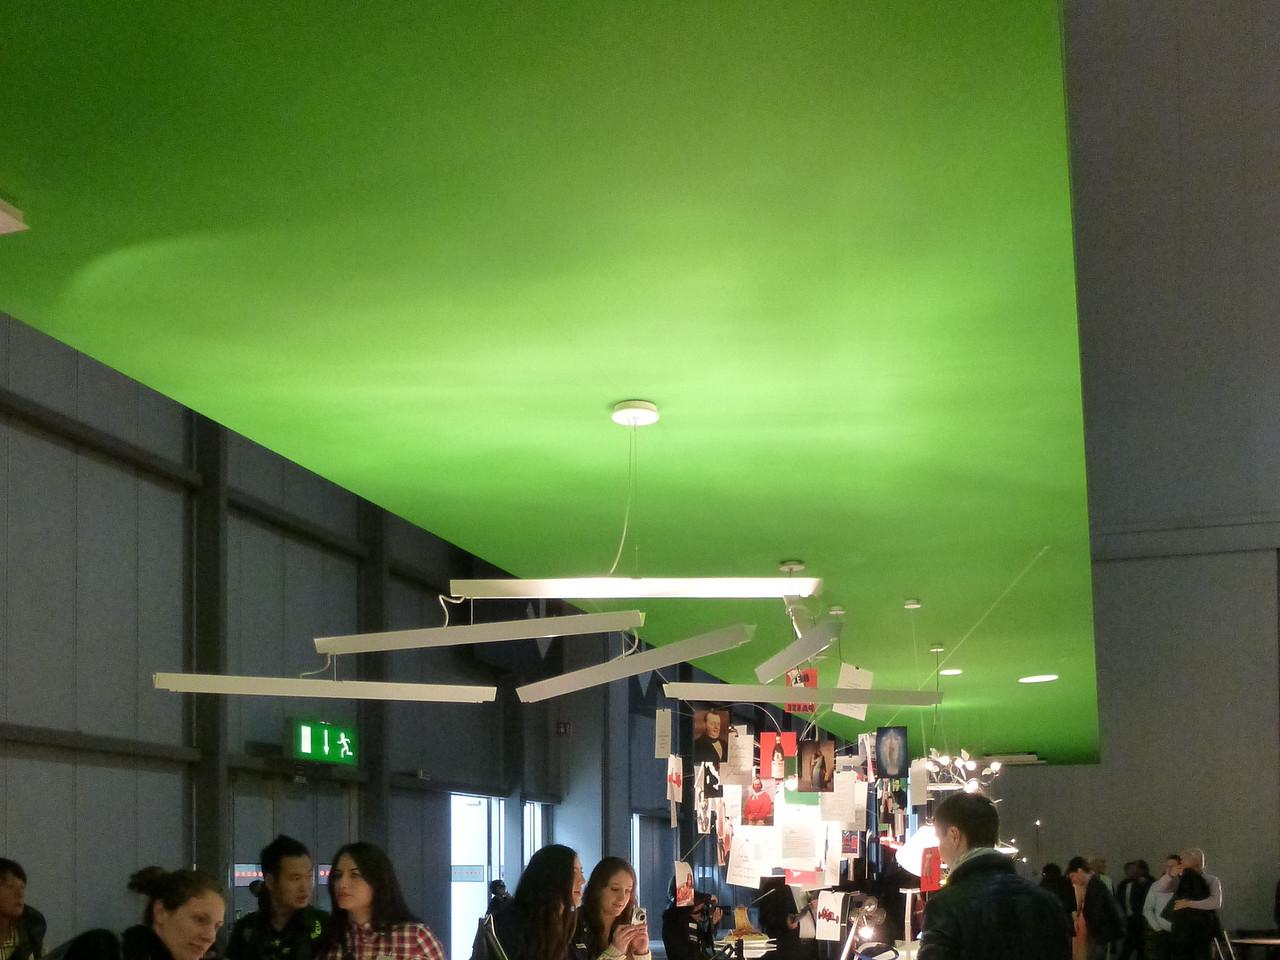 008 - 2013 Milan Color Trends - P10400888